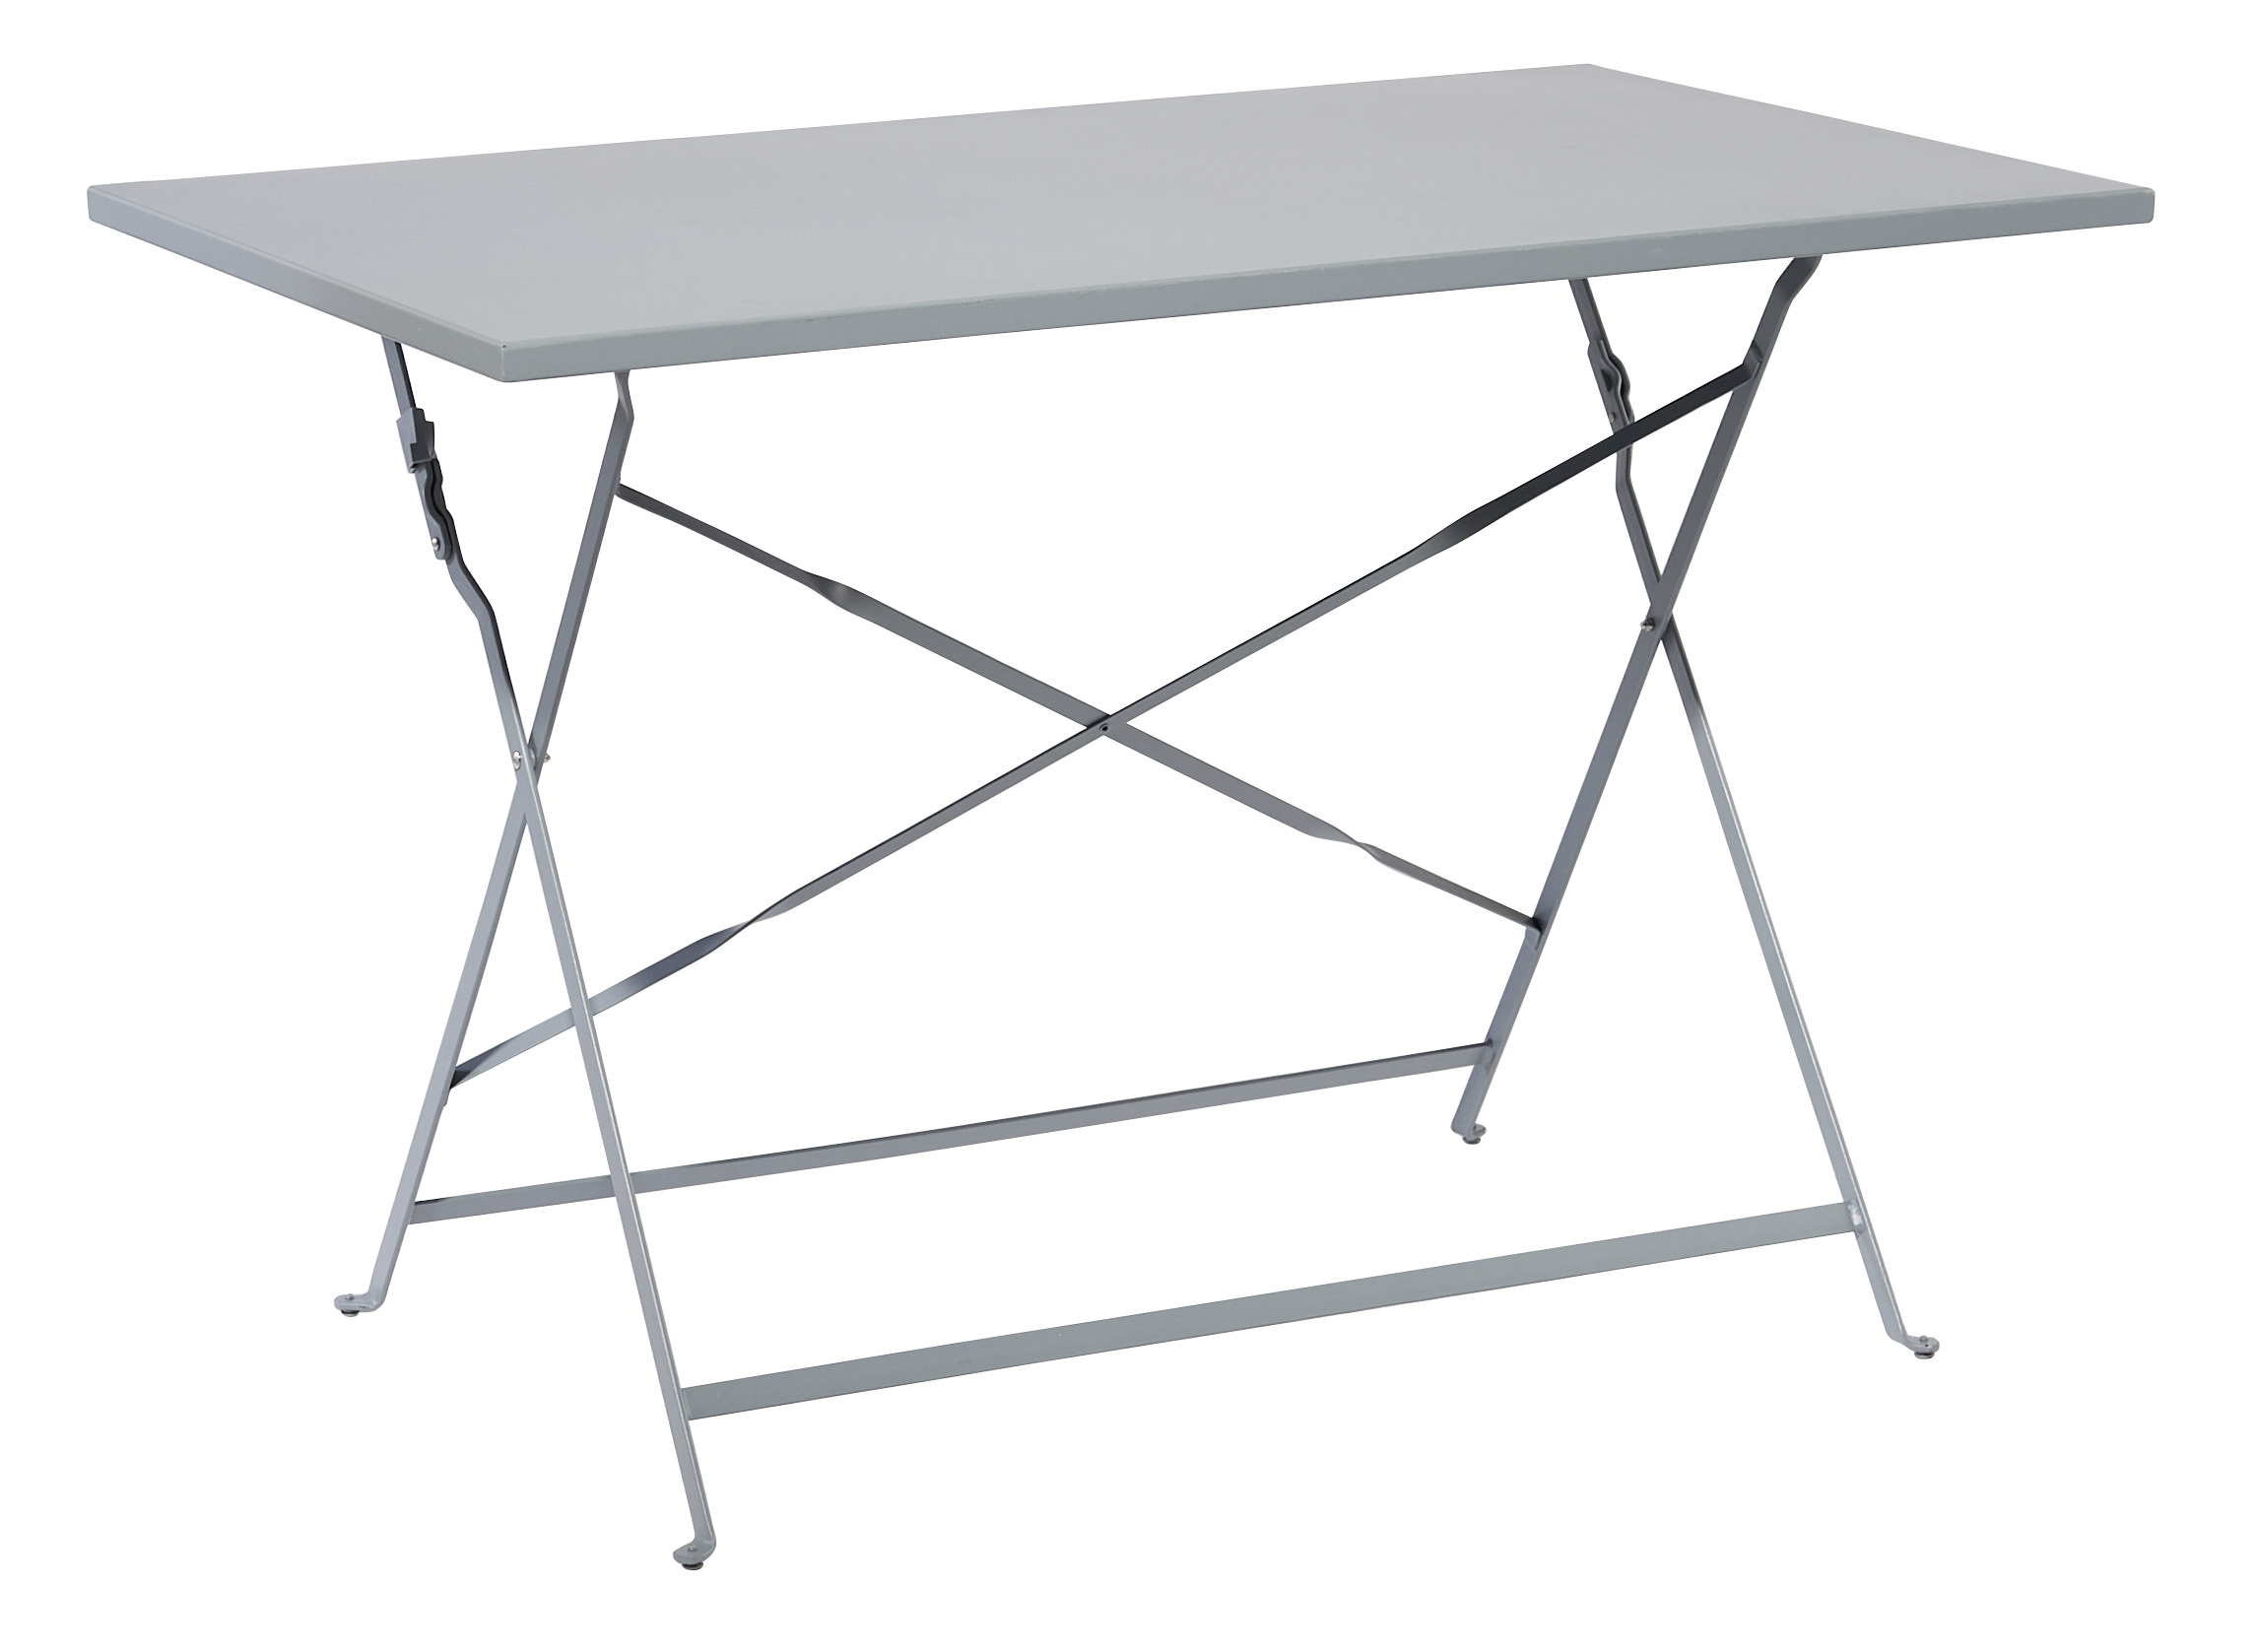 carrefour table bistrot rectangulaire gris fse1306t. Black Bedroom Furniture Sets. Home Design Ideas